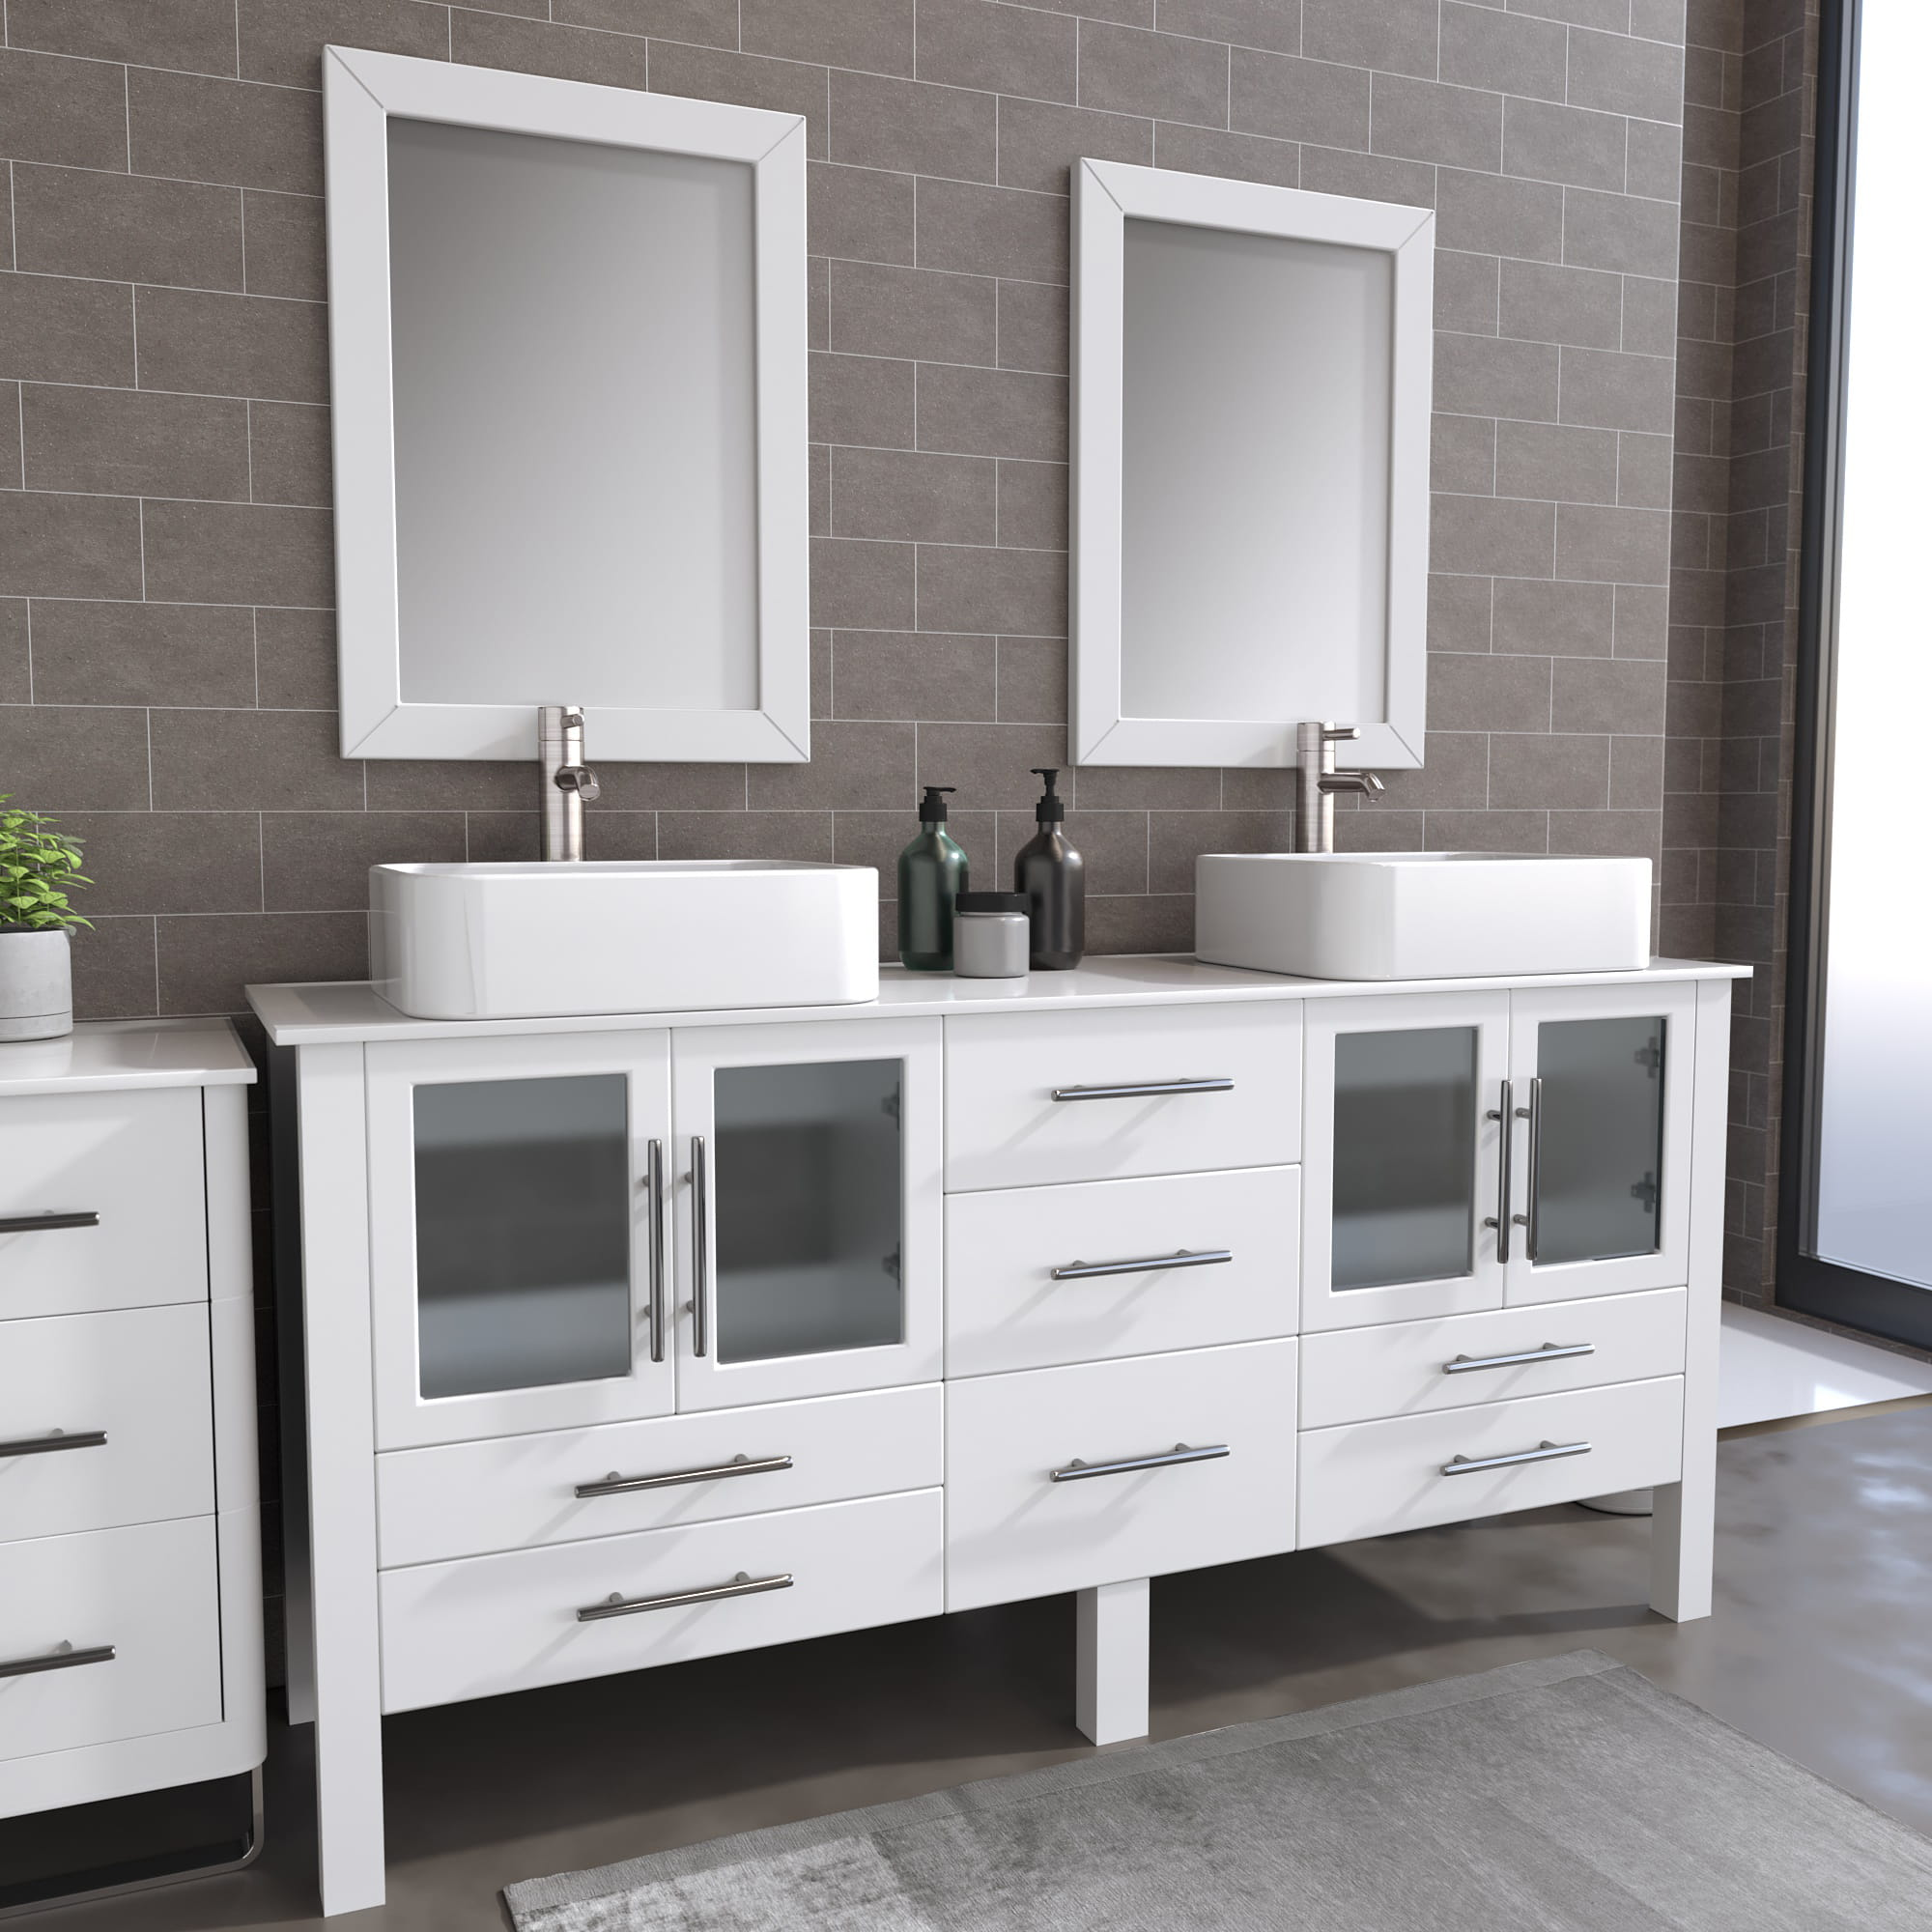 8119XLW_BN_1 White XL Double Porcelain Vessel Sink Vanity SetulG0kgs